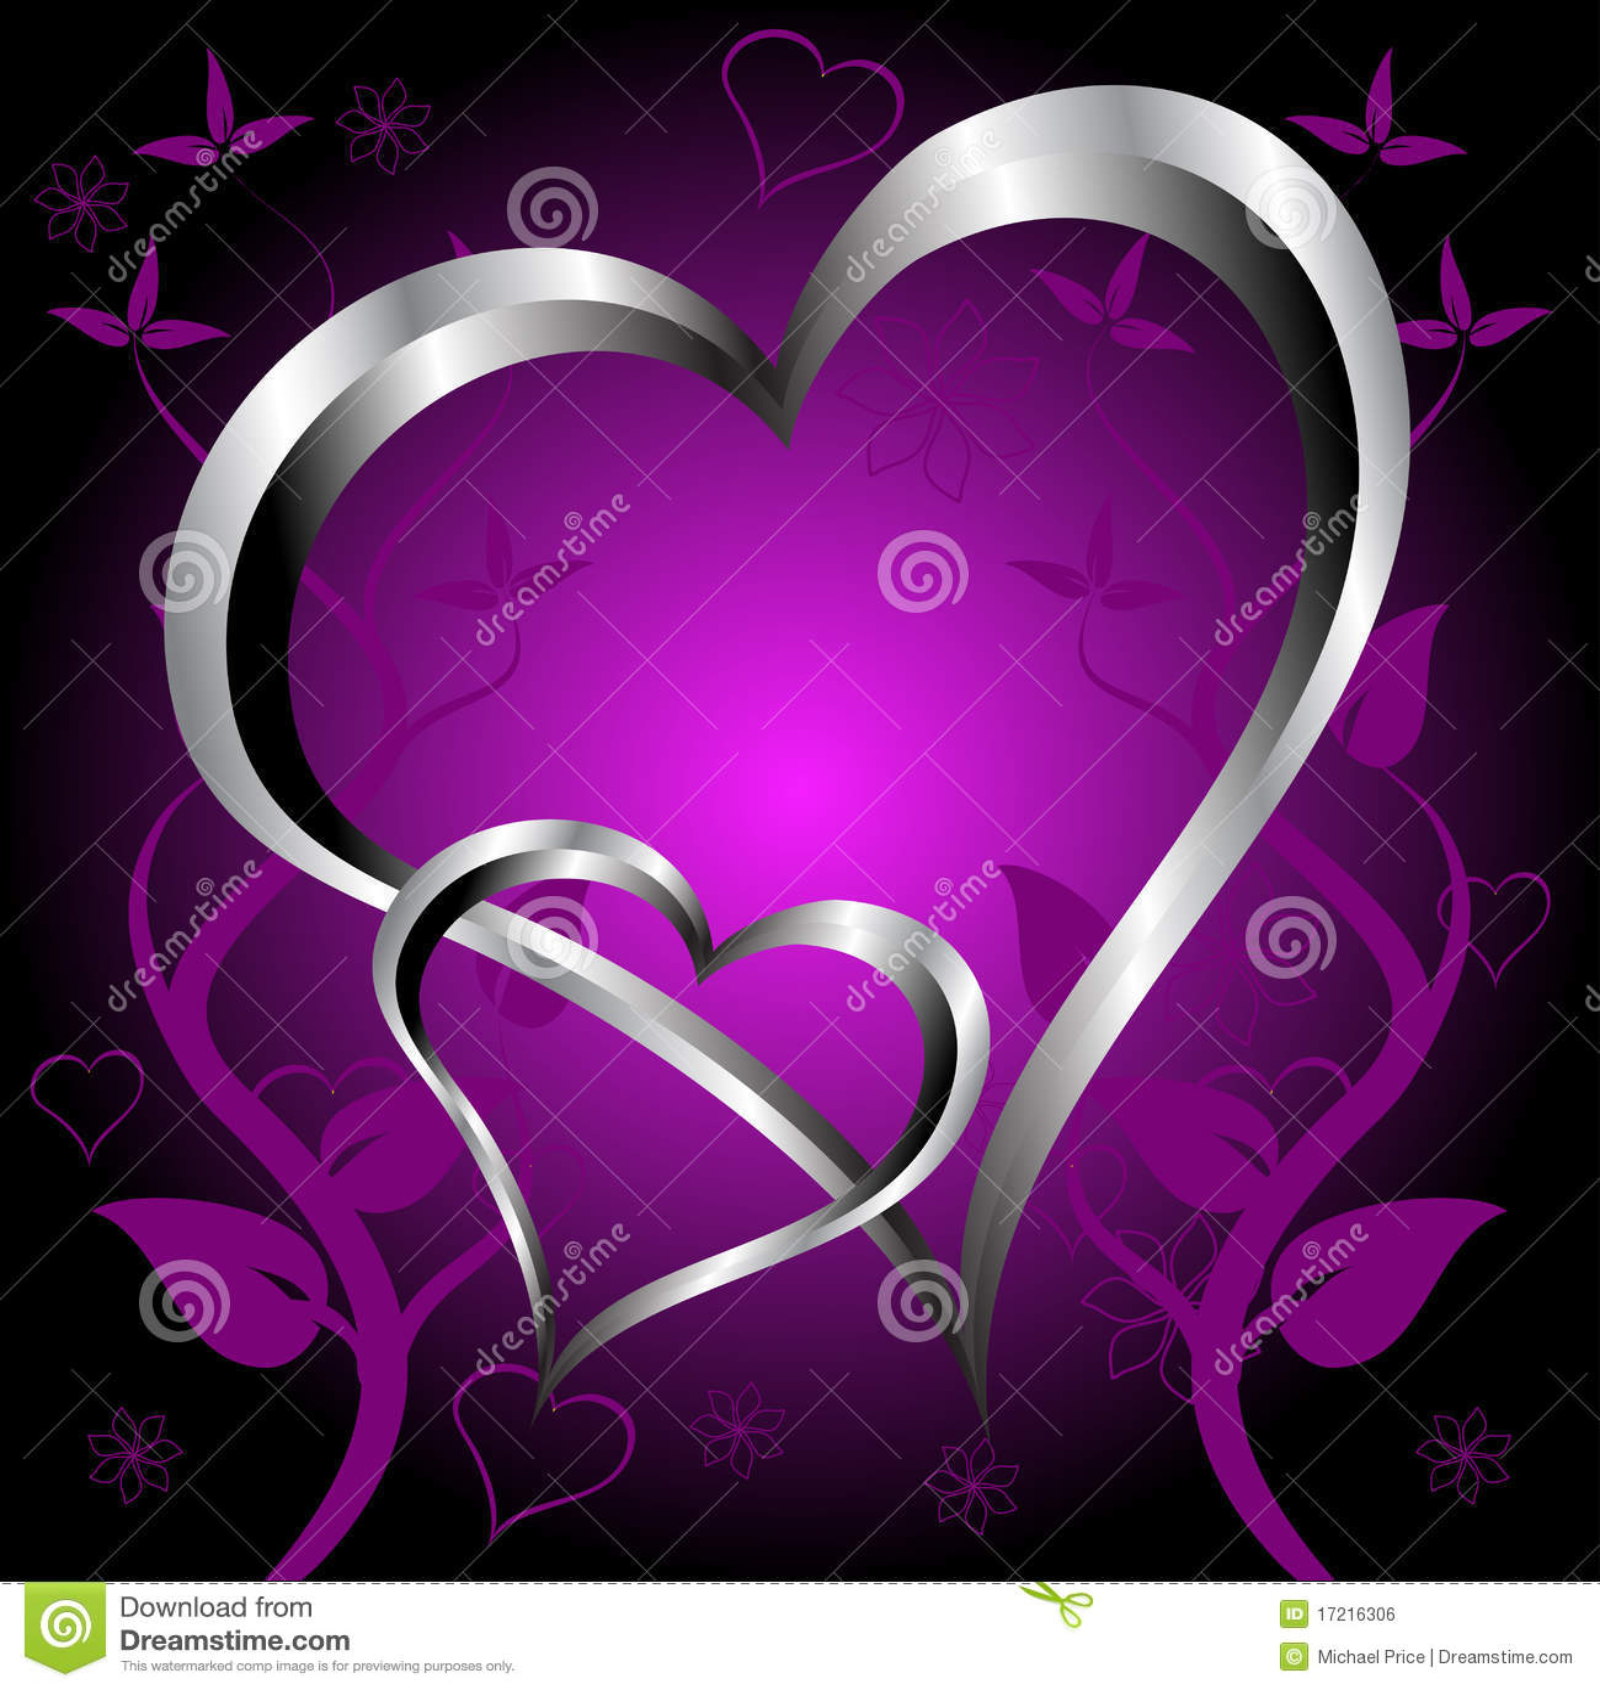 purple love valentine day - photo #19